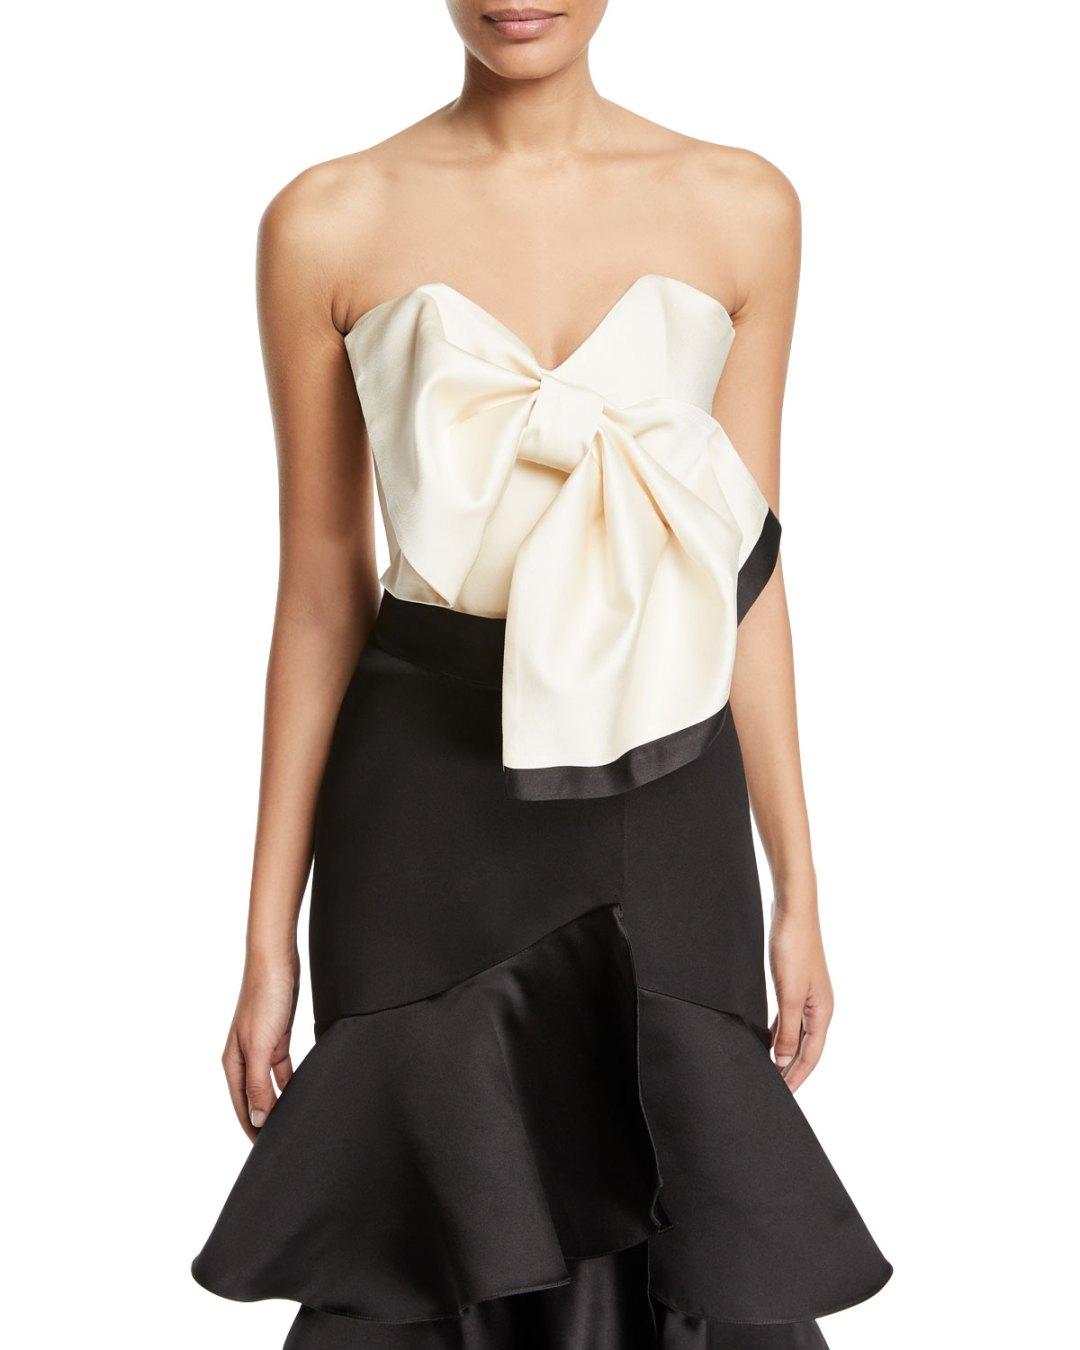 c1986ef5d1dcb JOHANNA ORTIZ – Las Meninas Strapless Satin Top – Bergdorf Goodman (Neiman  Marcus) –  1